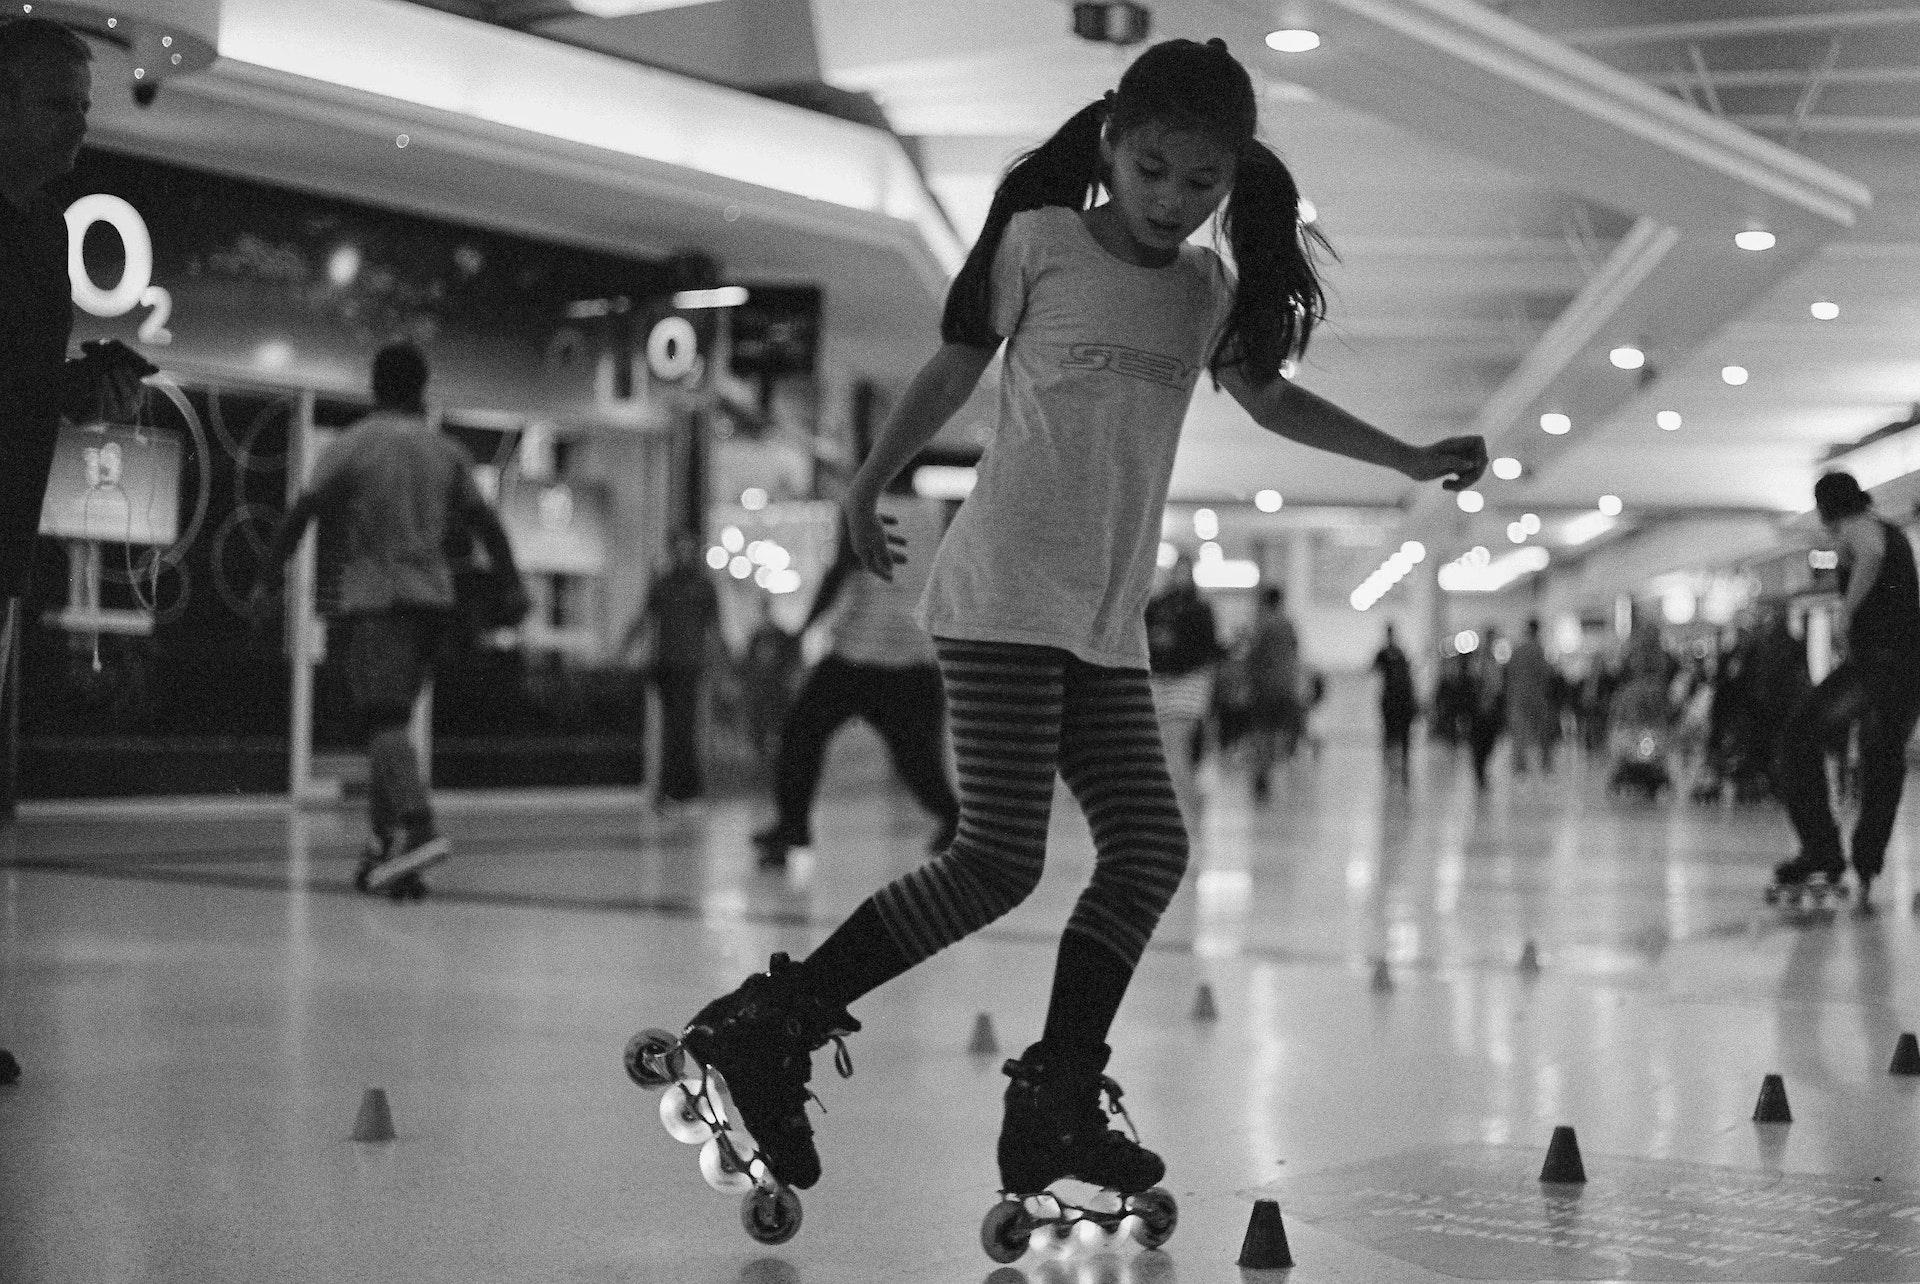 Stratford_Centre_Skaters_Lighter-10